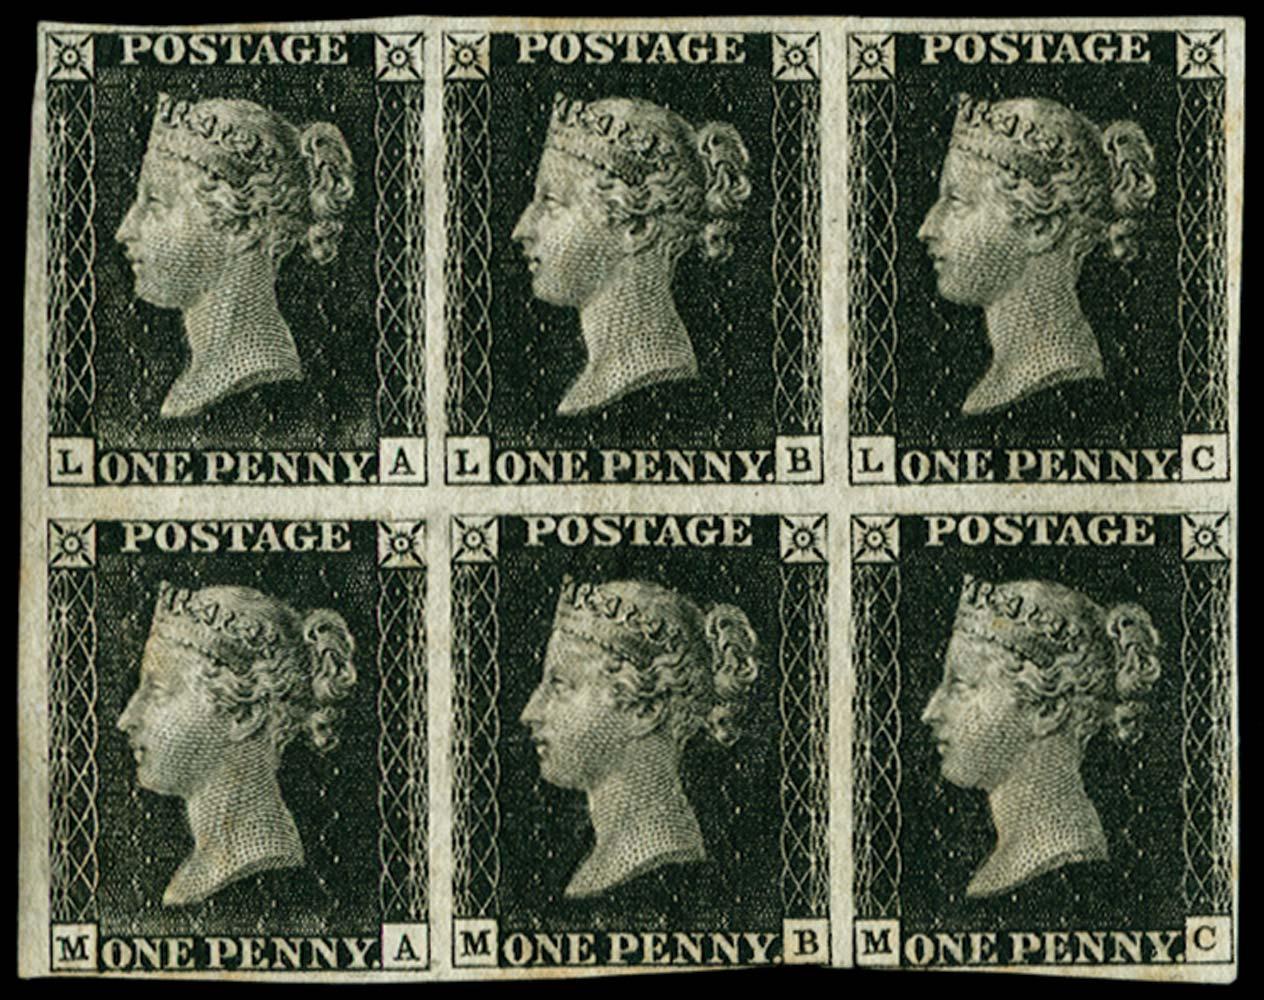 GB 1840  SG2 Pl.5 Penny Black block of six